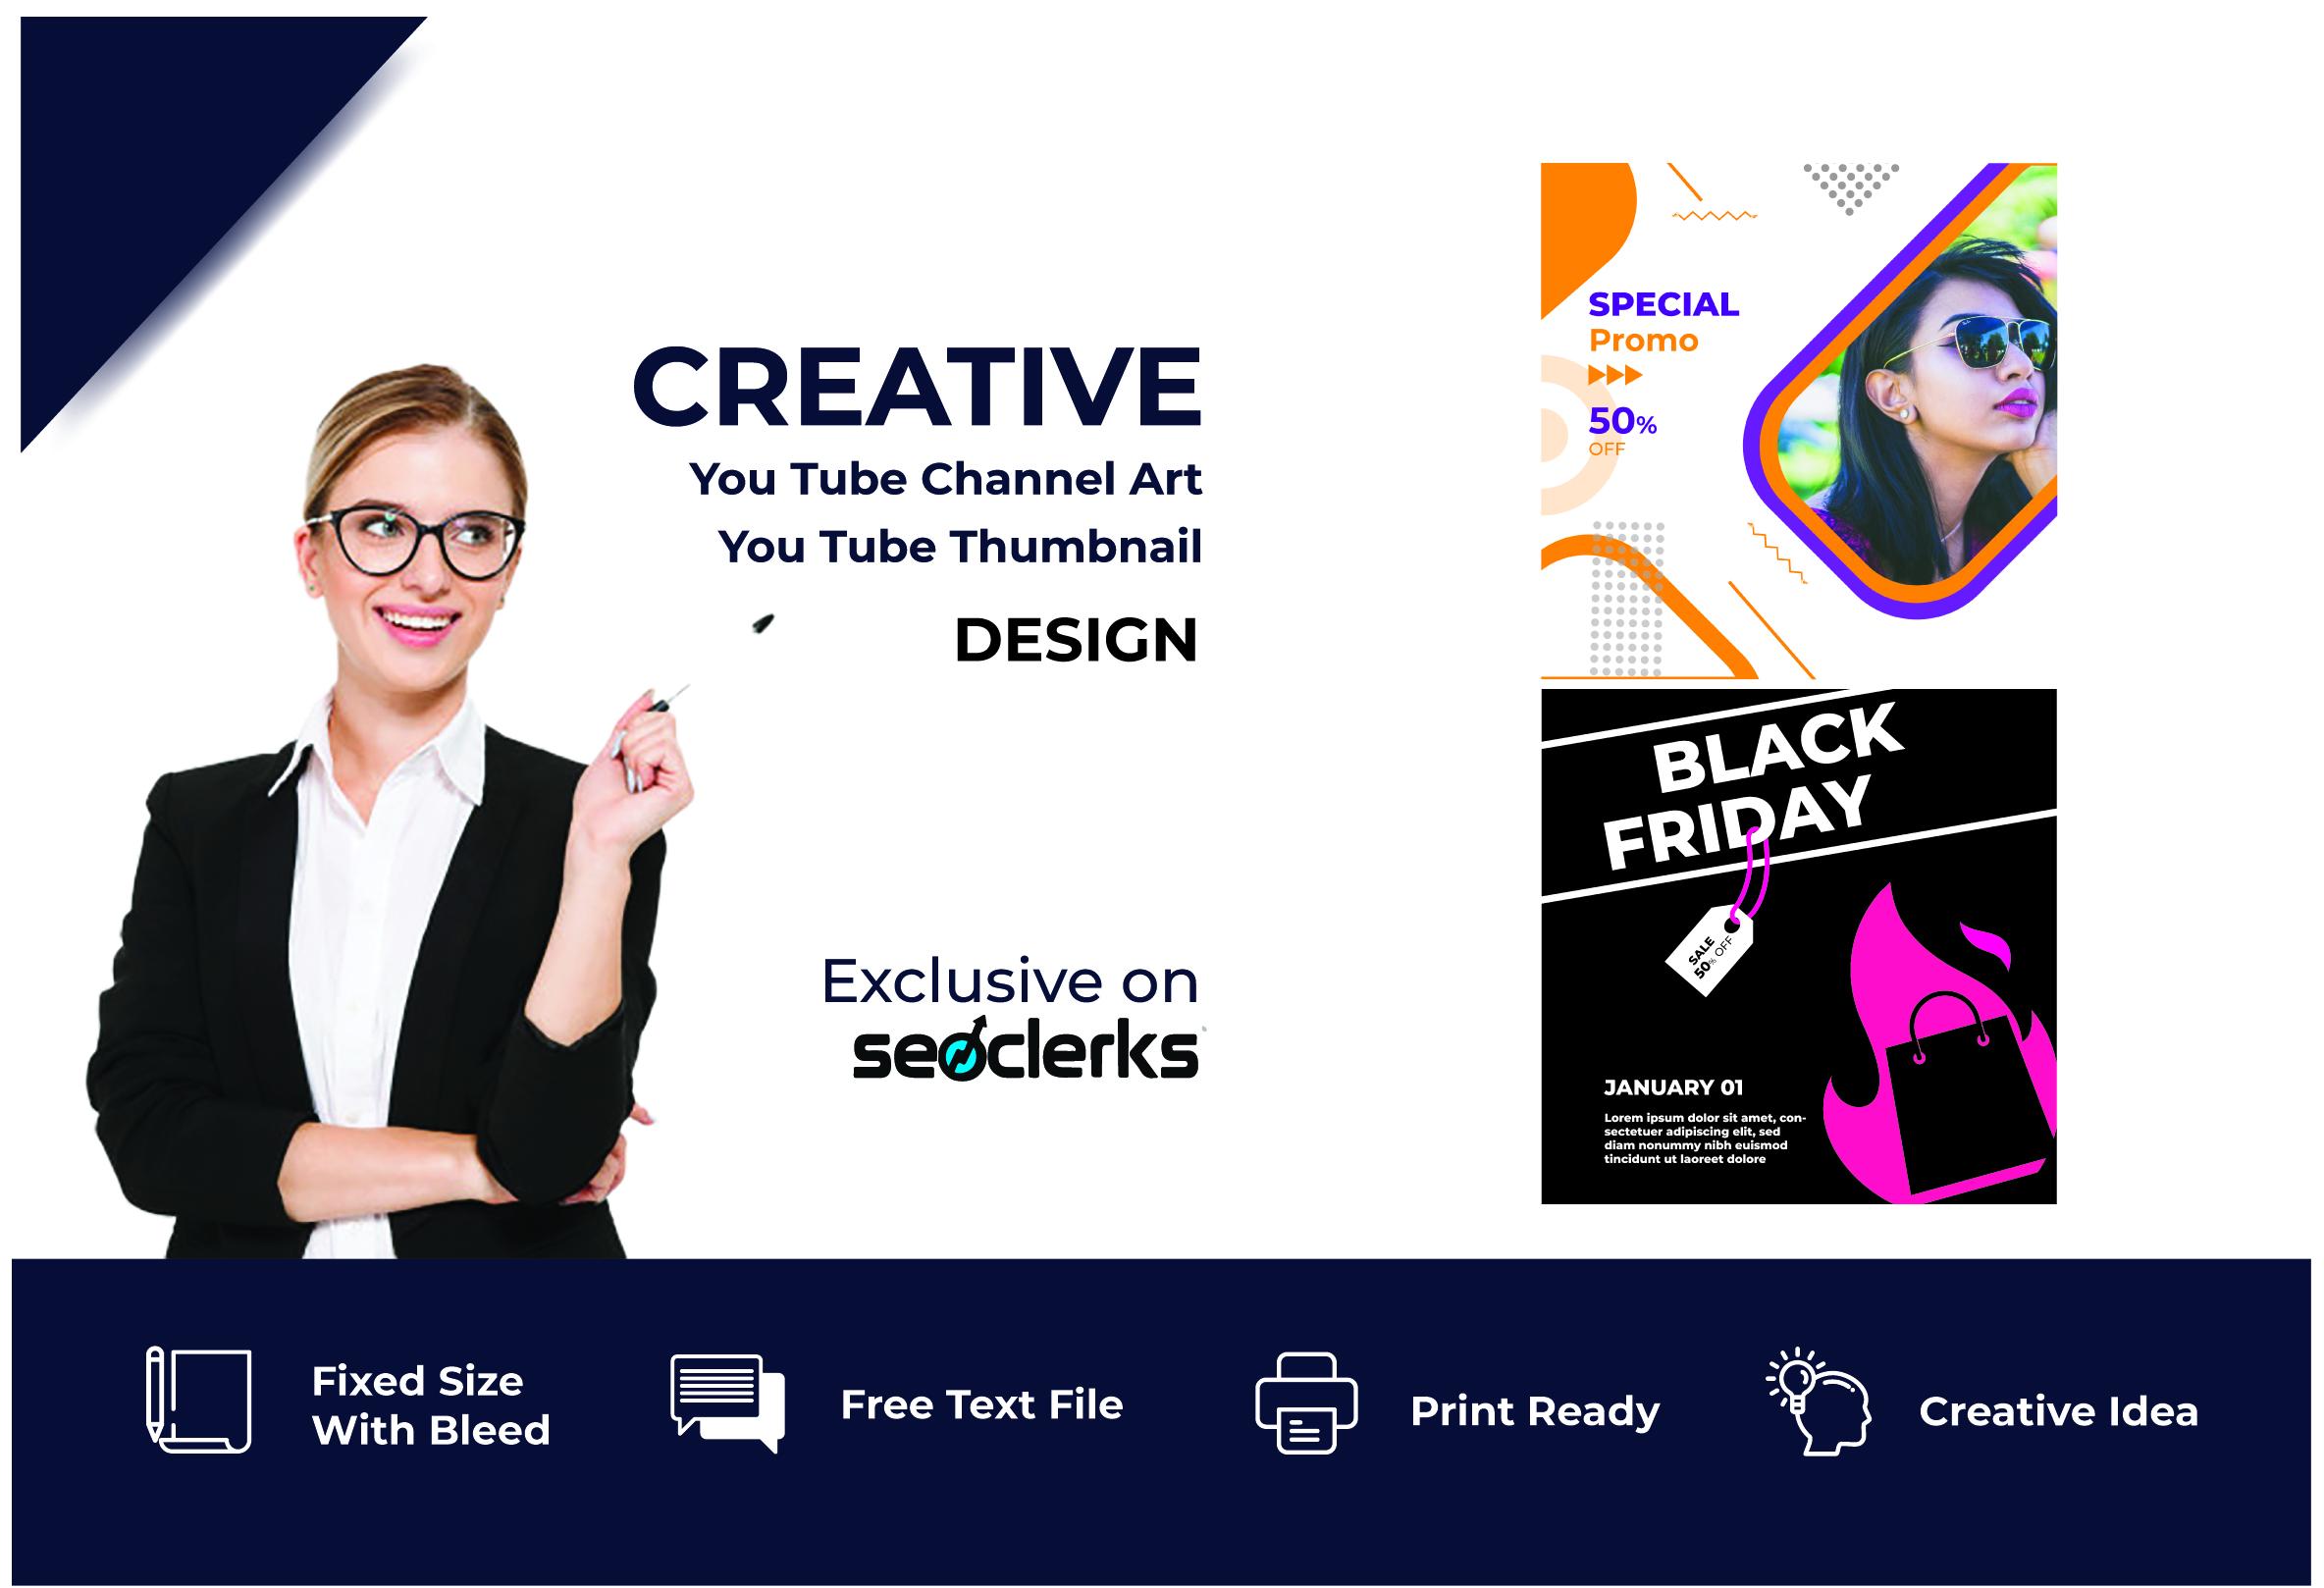 I will create Exclusive social media post design